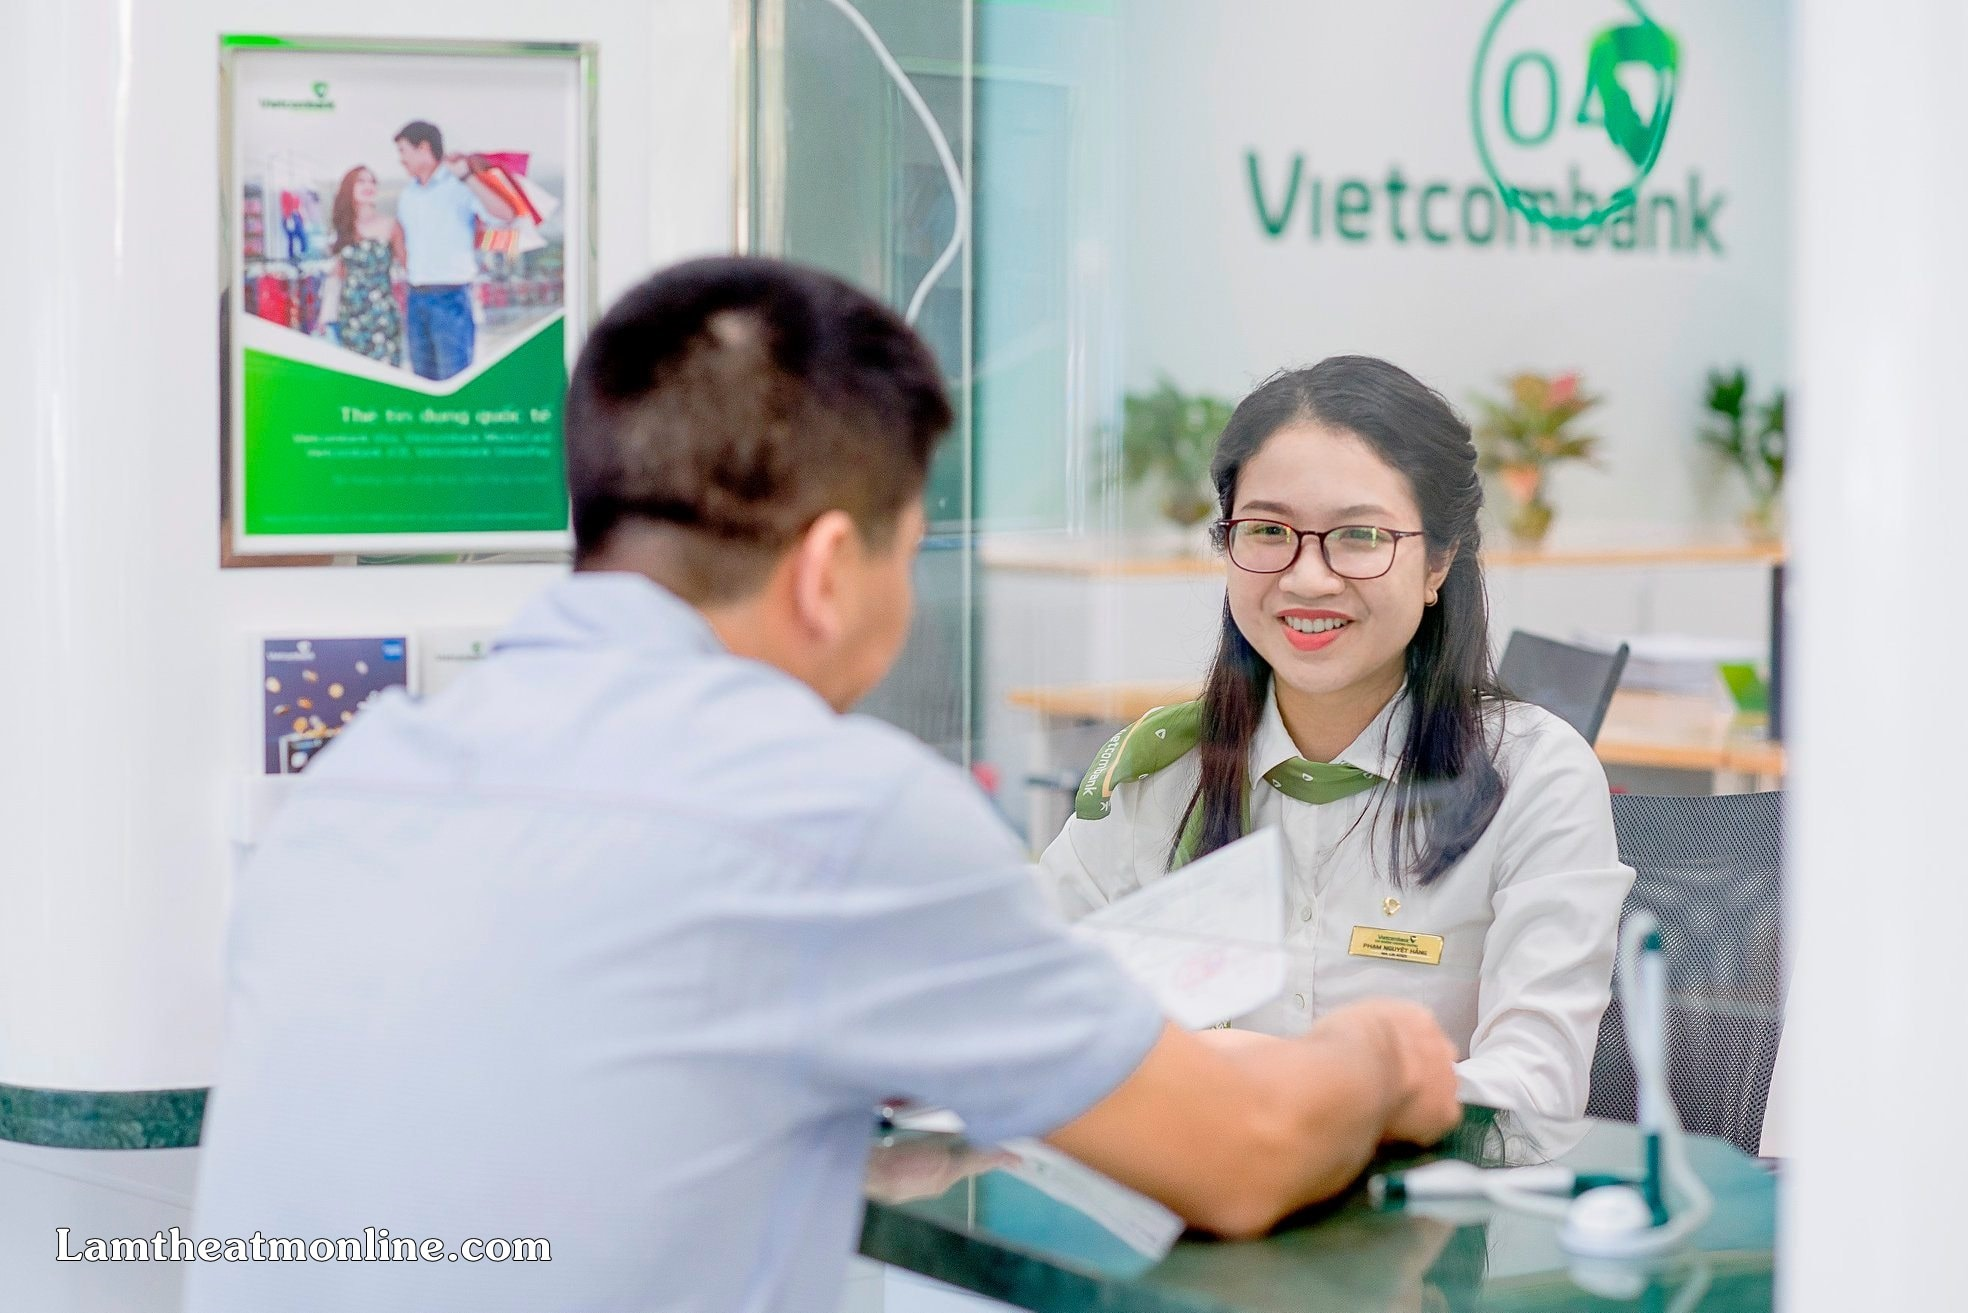 the visa vietcombank het han phai lam sao